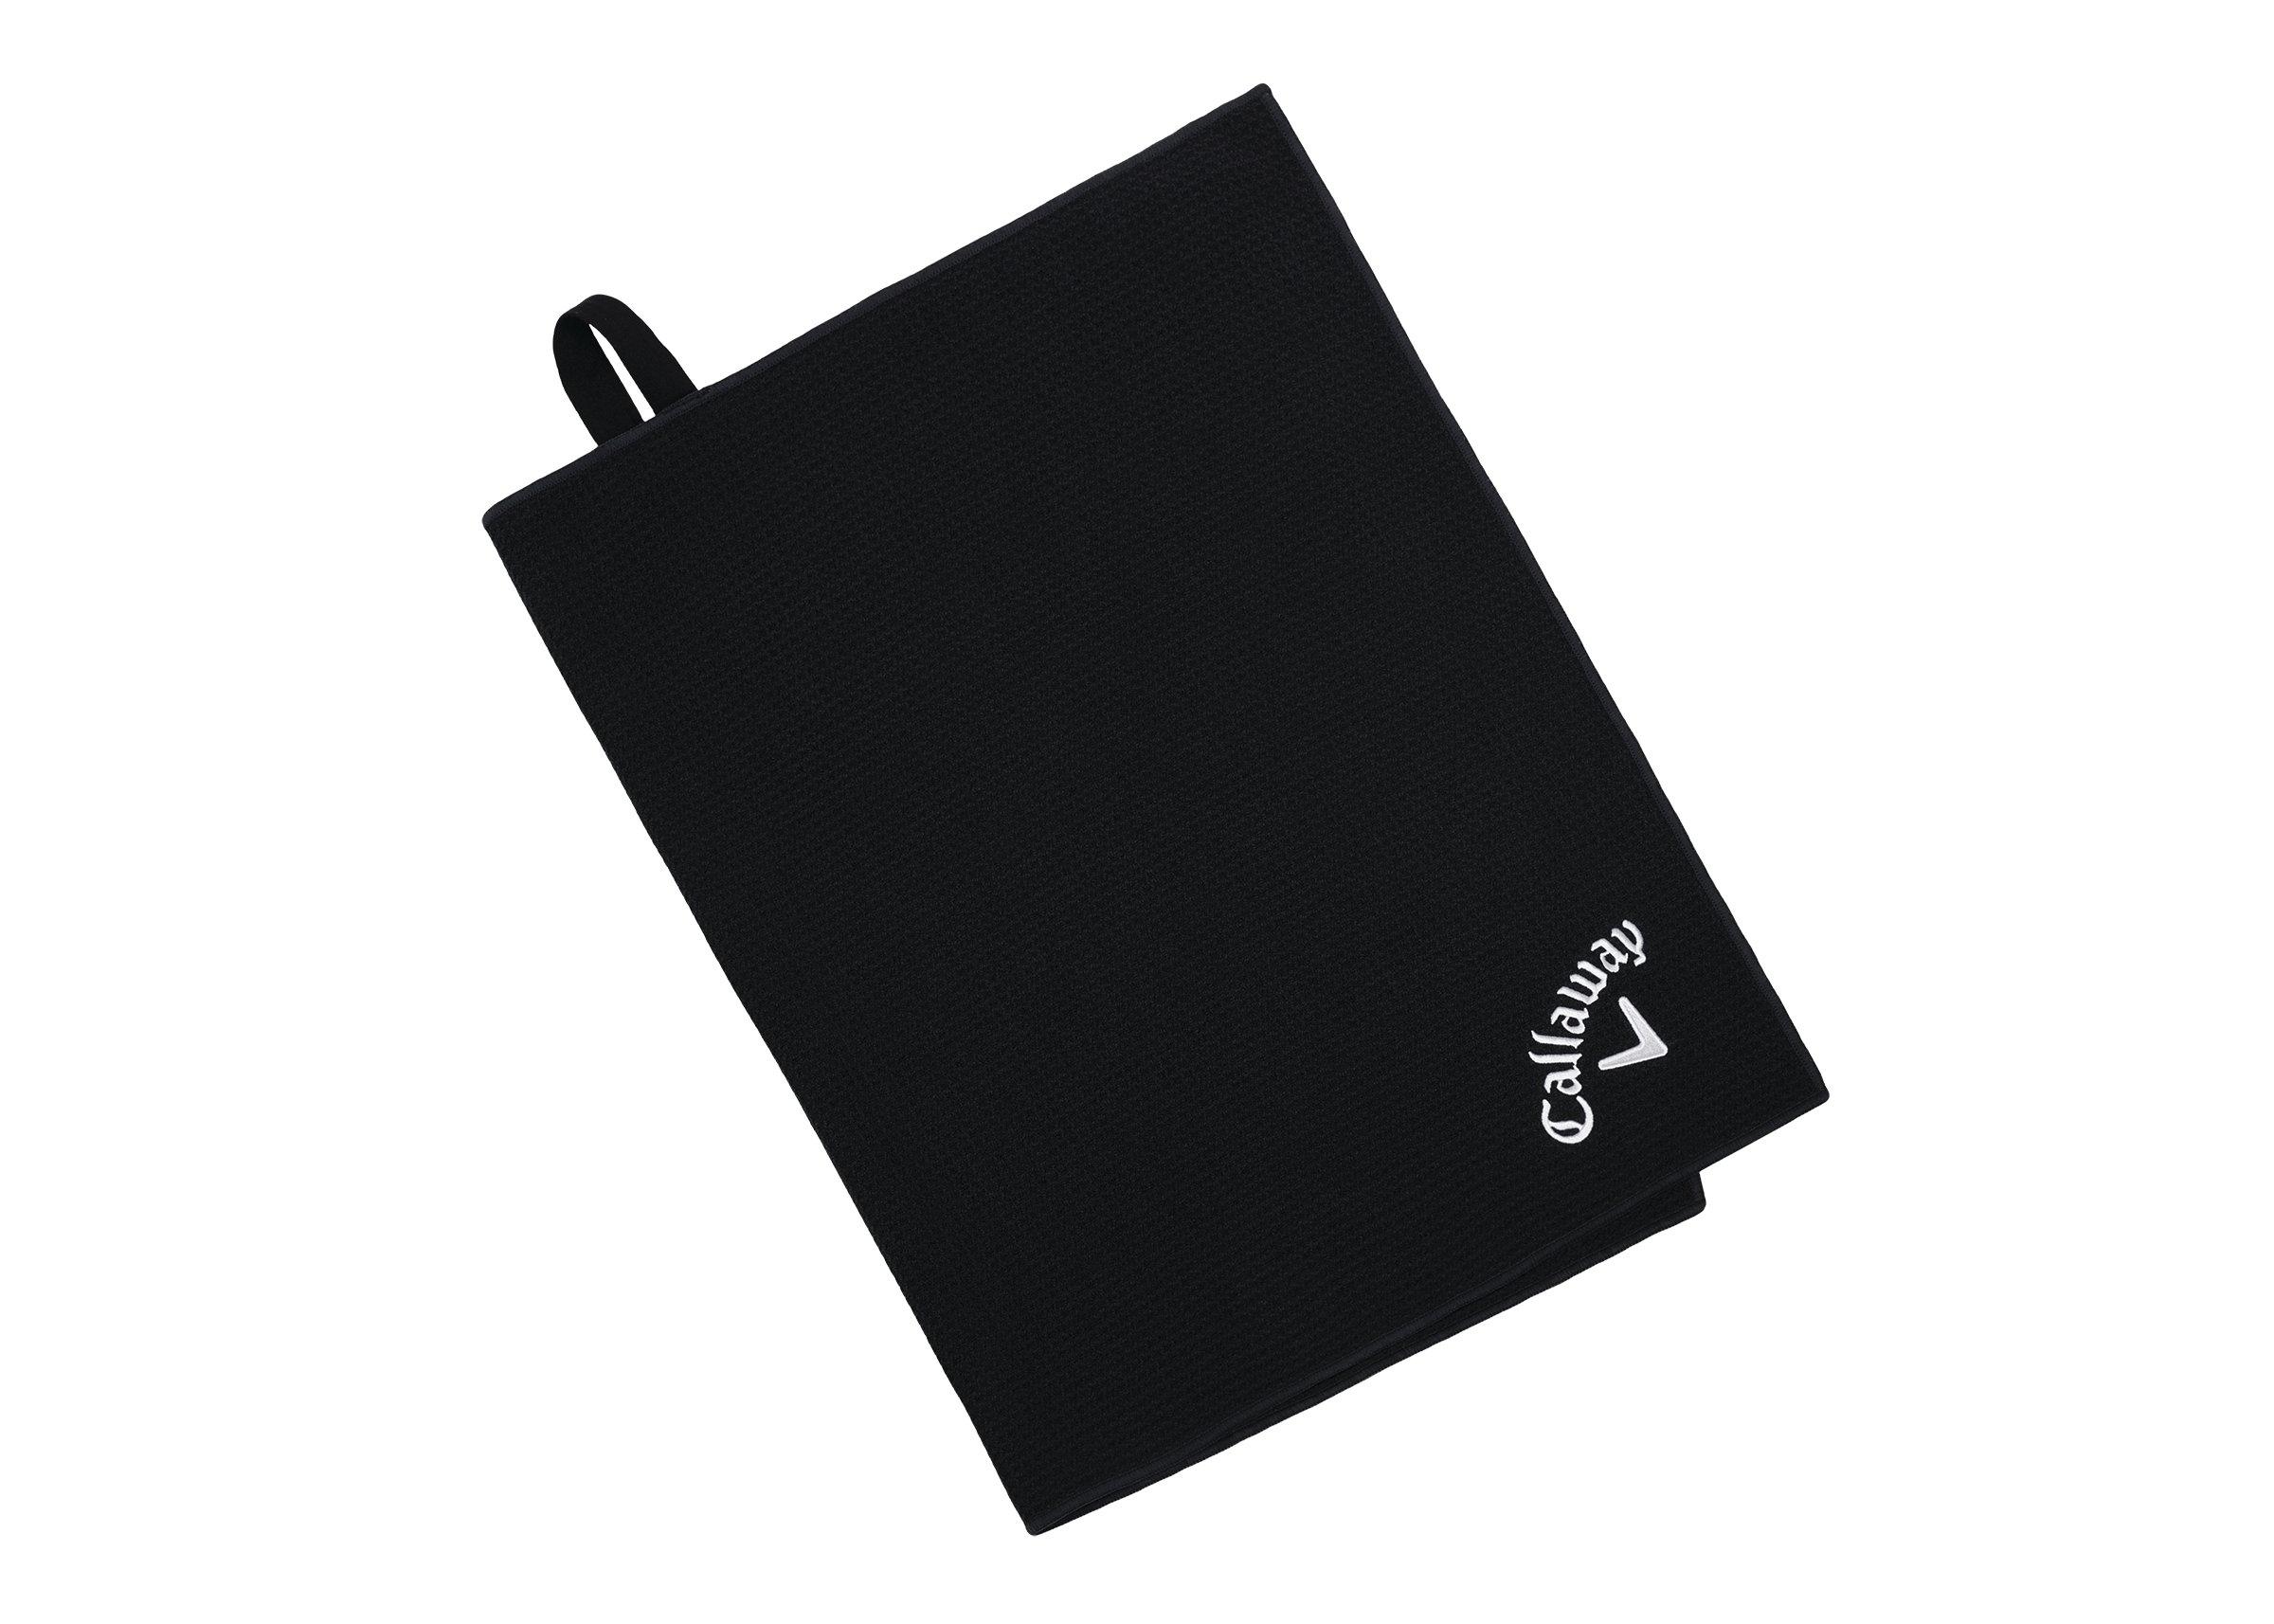 Callaway Golf 2017 Microfiber Players Tour Towel, Black, 20 x 30 by Callaway